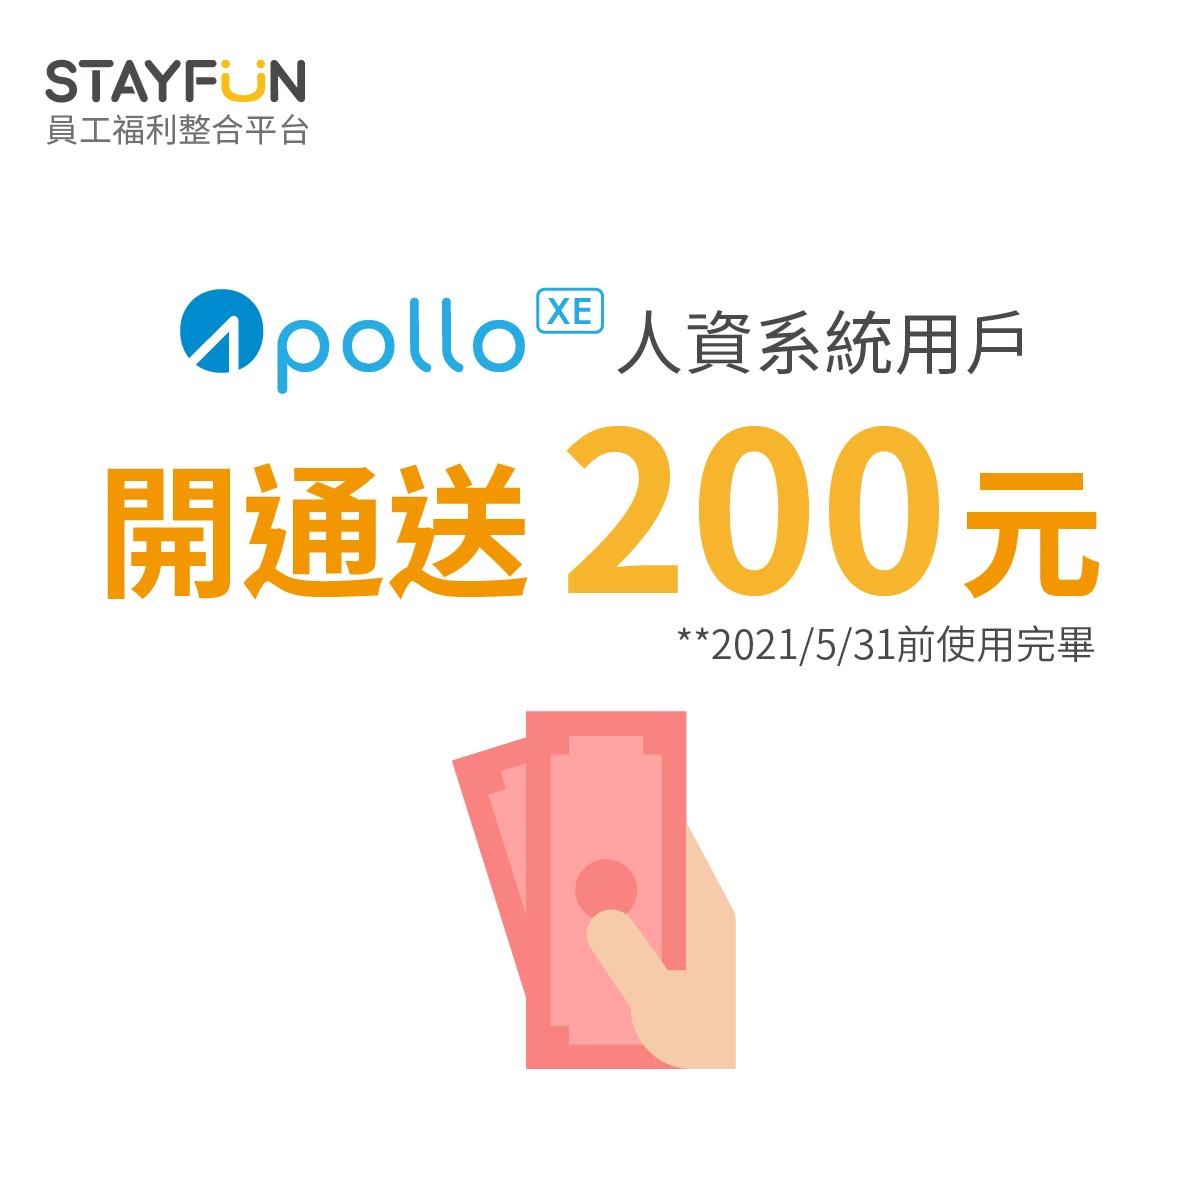 開通Apollo贈送200元